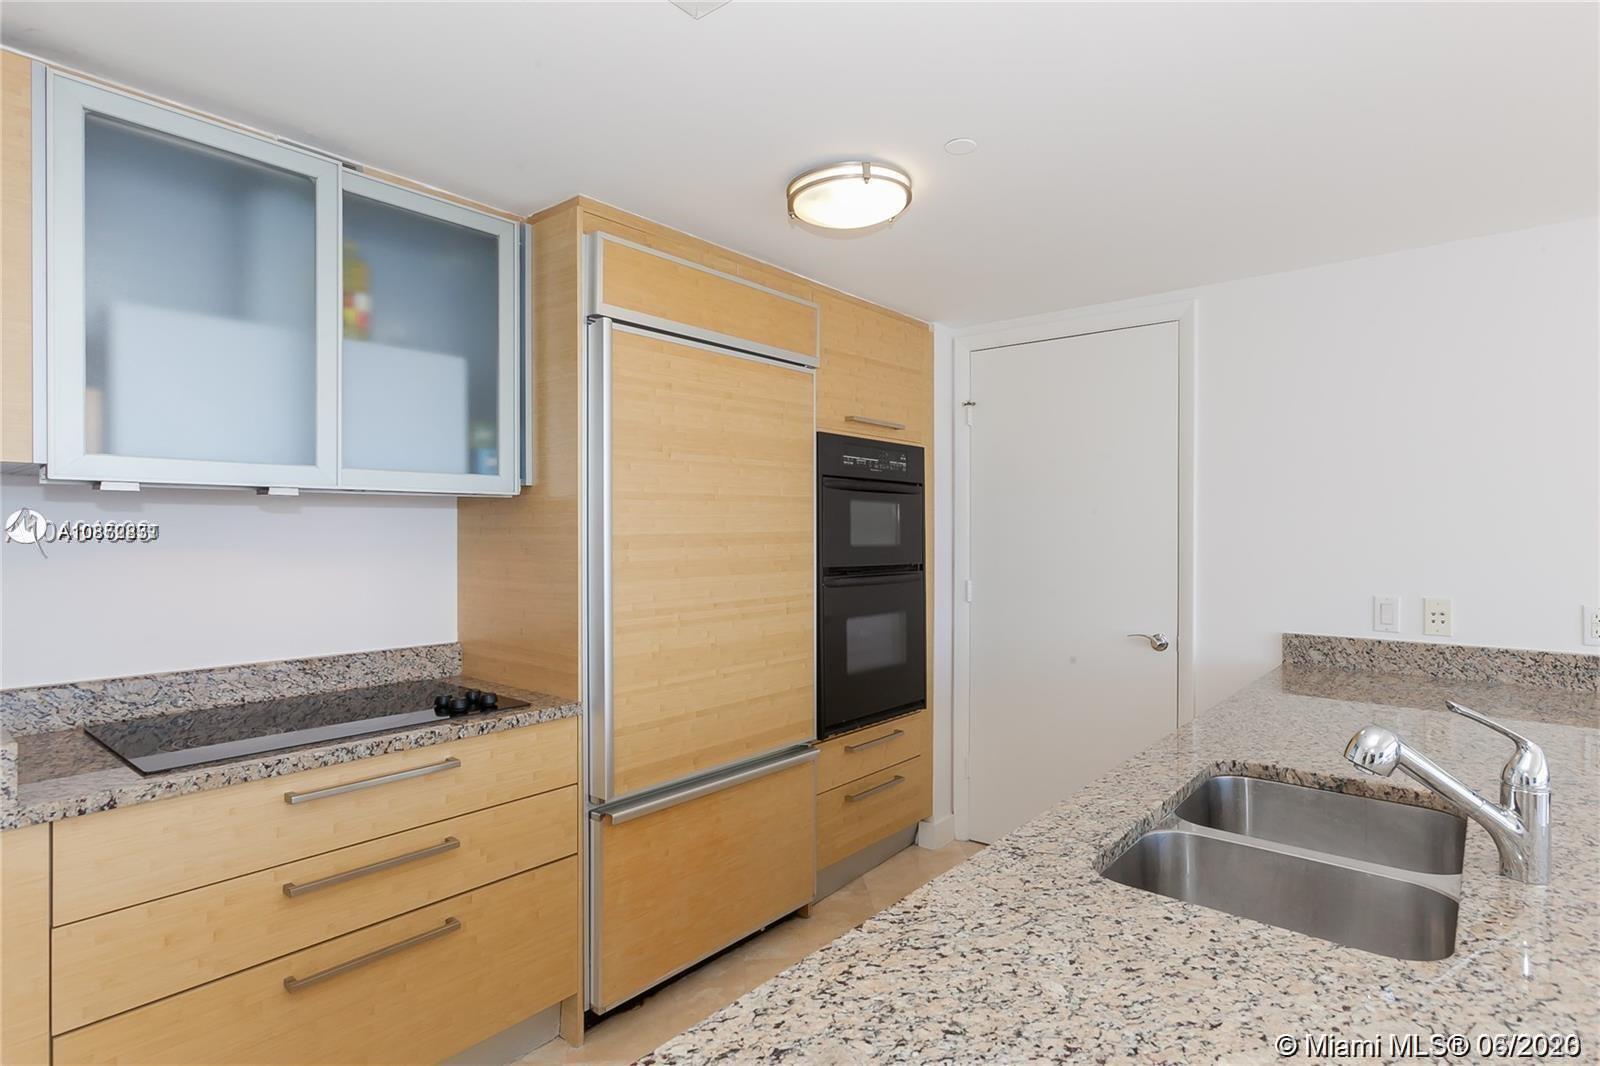 2407 1 / 1 871 sq. ft. $ 2020-06-09 0 Photo